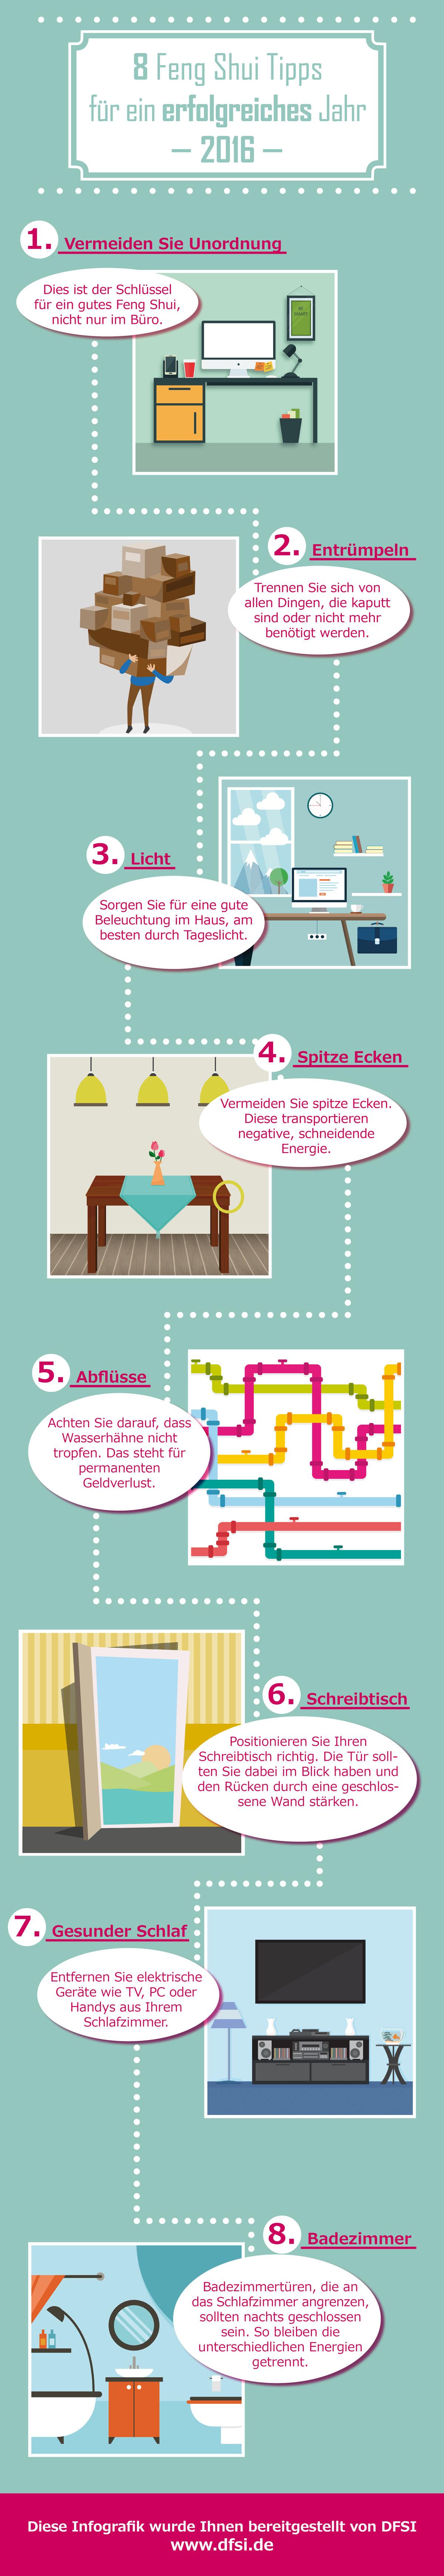 8 Feng Shui Tipps | Feng Shui Infographics | Pinterest | Feng shui ...